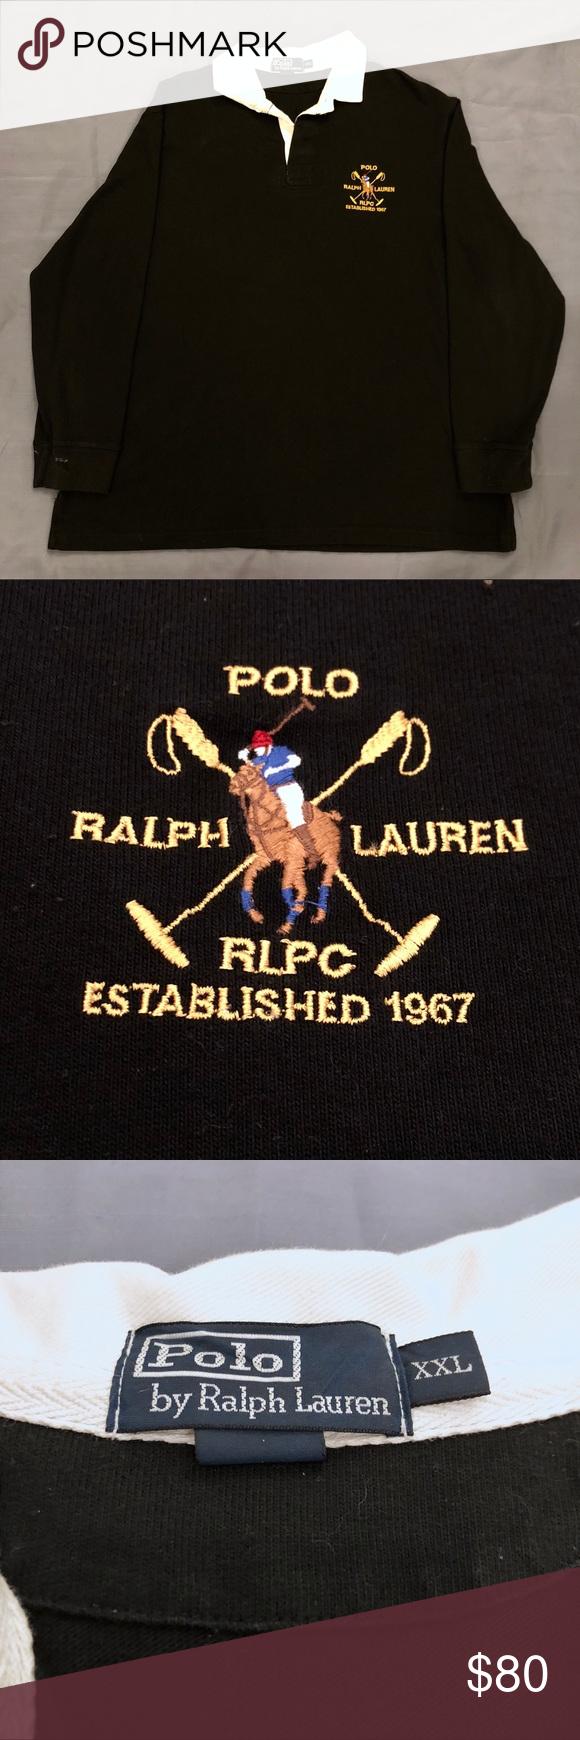 Vintage Polo Ralph Lauren Longsleeve Shirt Long Sleeve Shirts Vintage Polo Polo Ralph Lauren